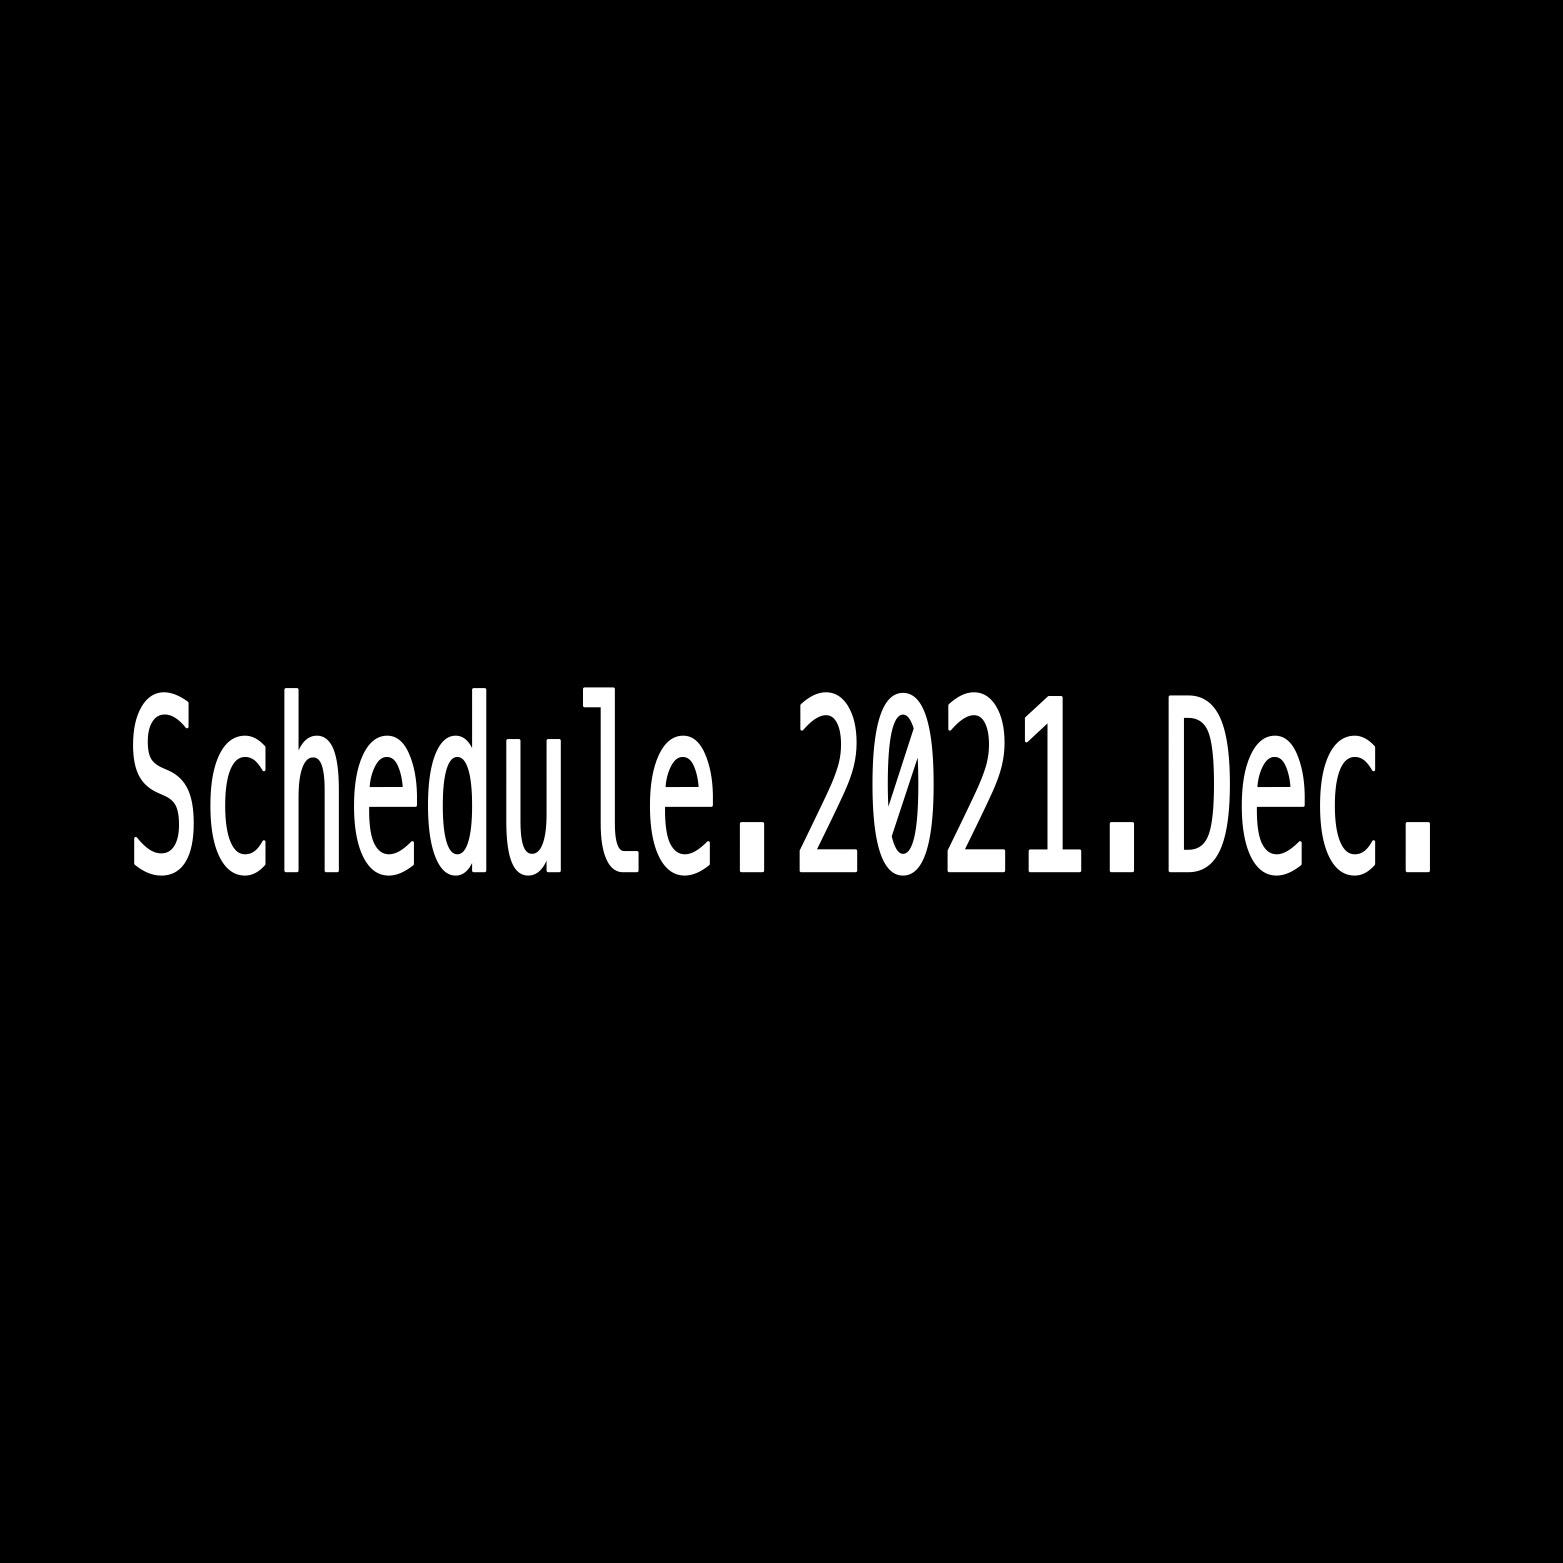 2021年12月Schedule